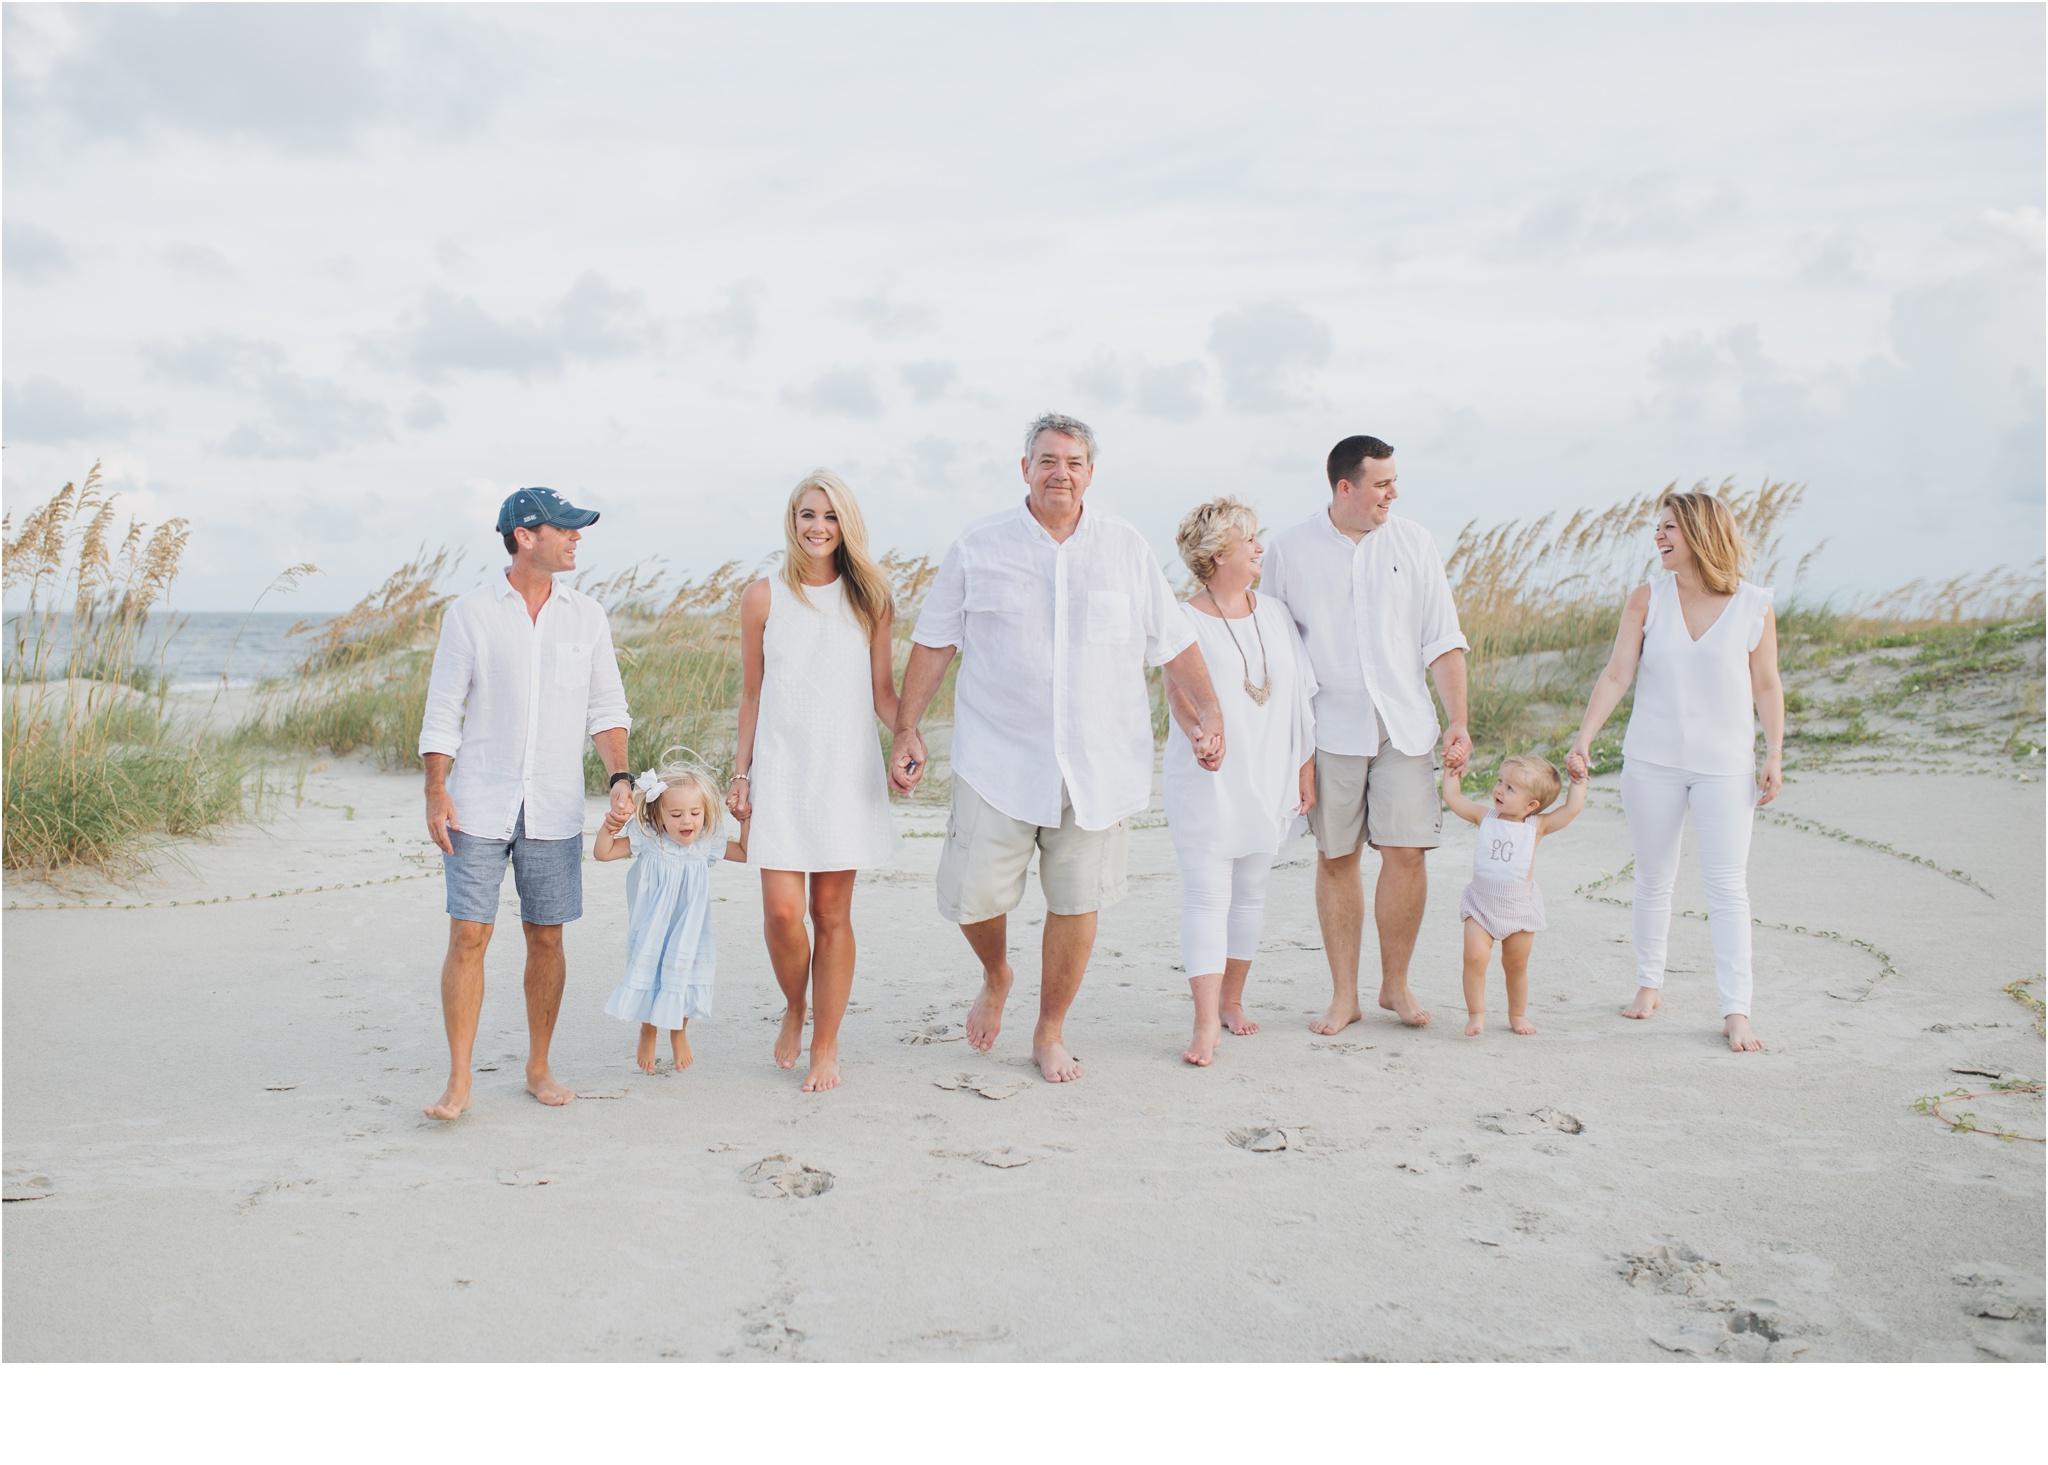 Rainey_Gregg_Photography_St._Simons_Island_Georgia_California_Wedding_Portrait_Photography_1189.jpg